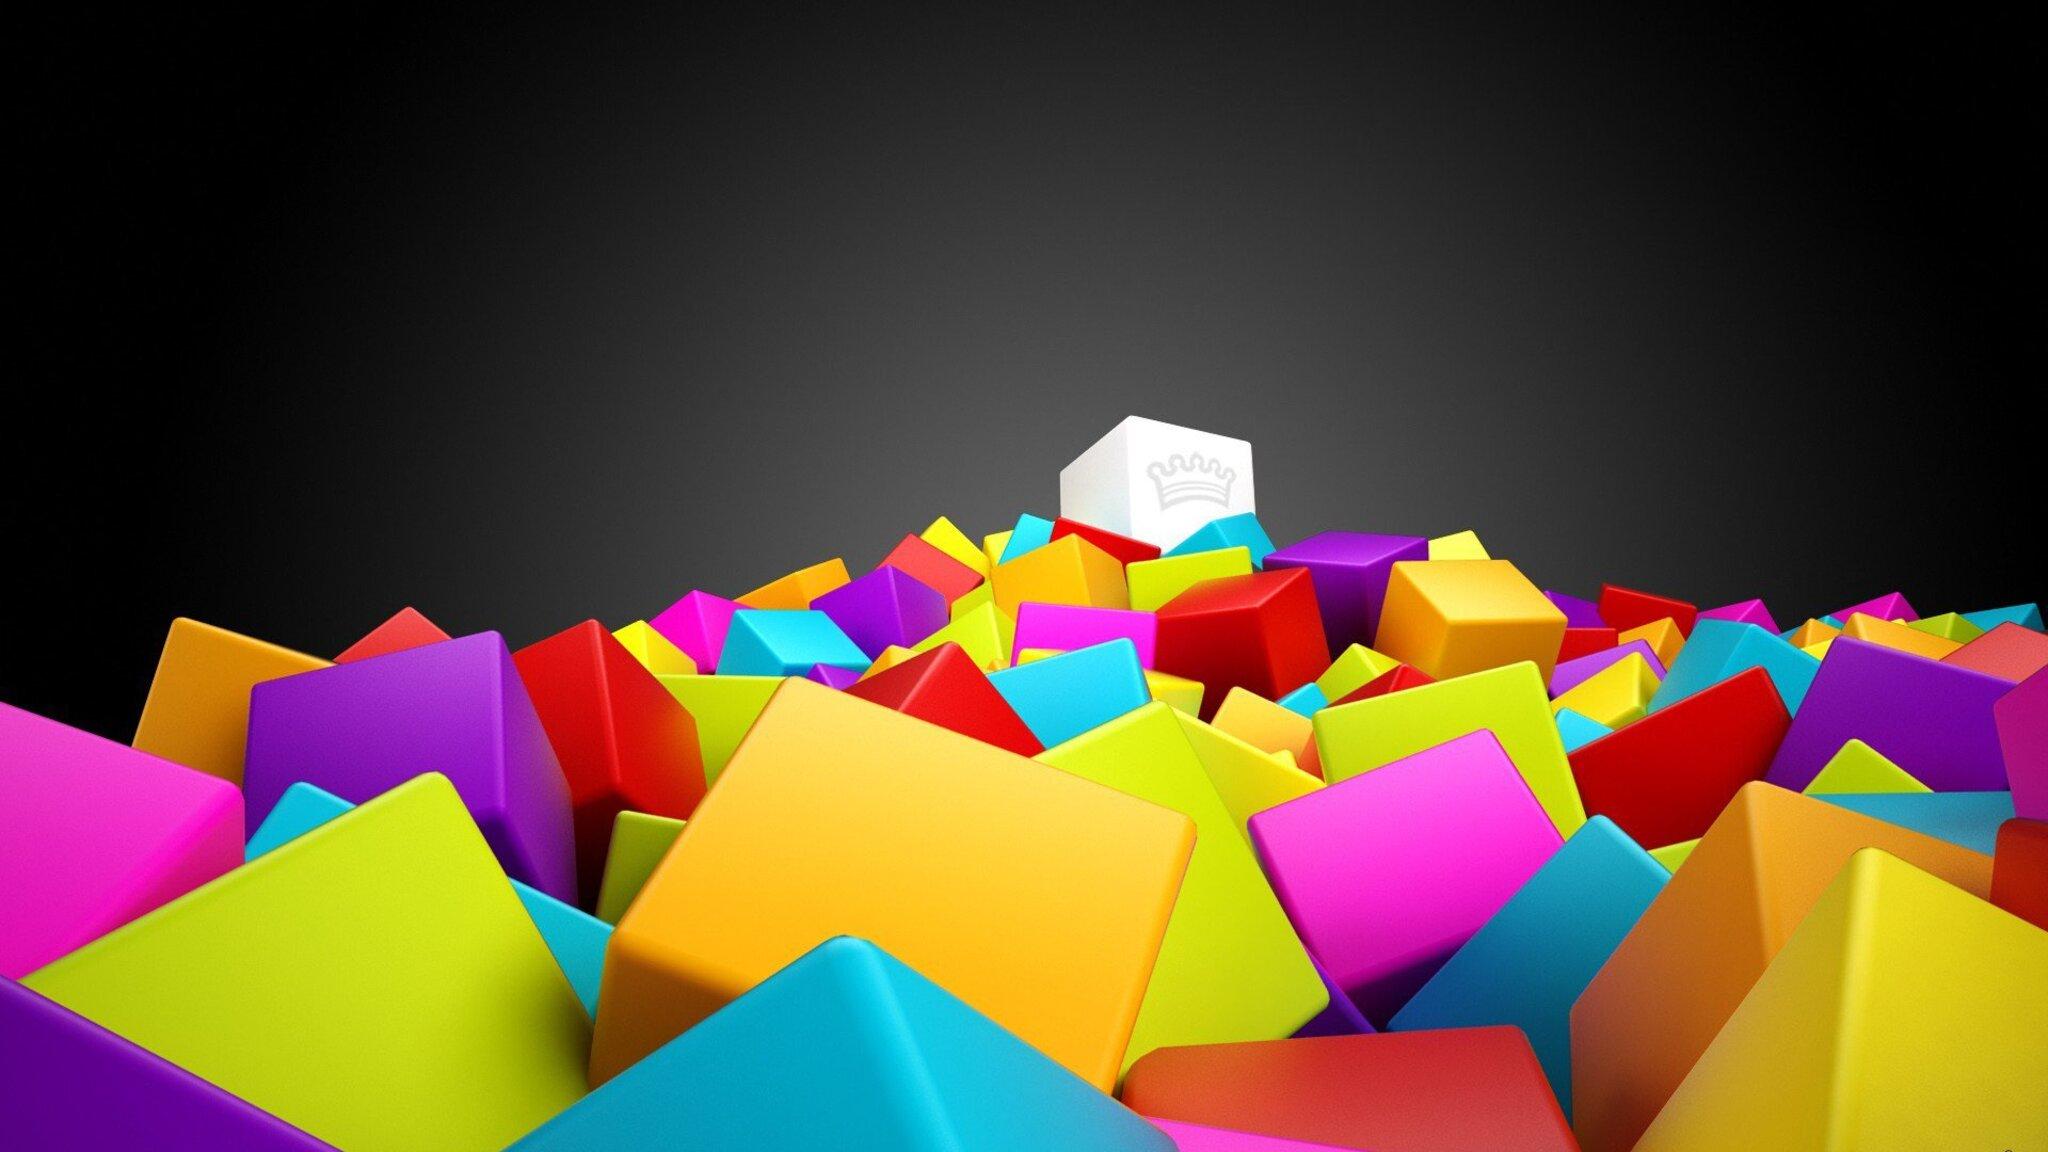 Download 3d Cubes HD Wallpaper In 2048x1152 Screen Resolution